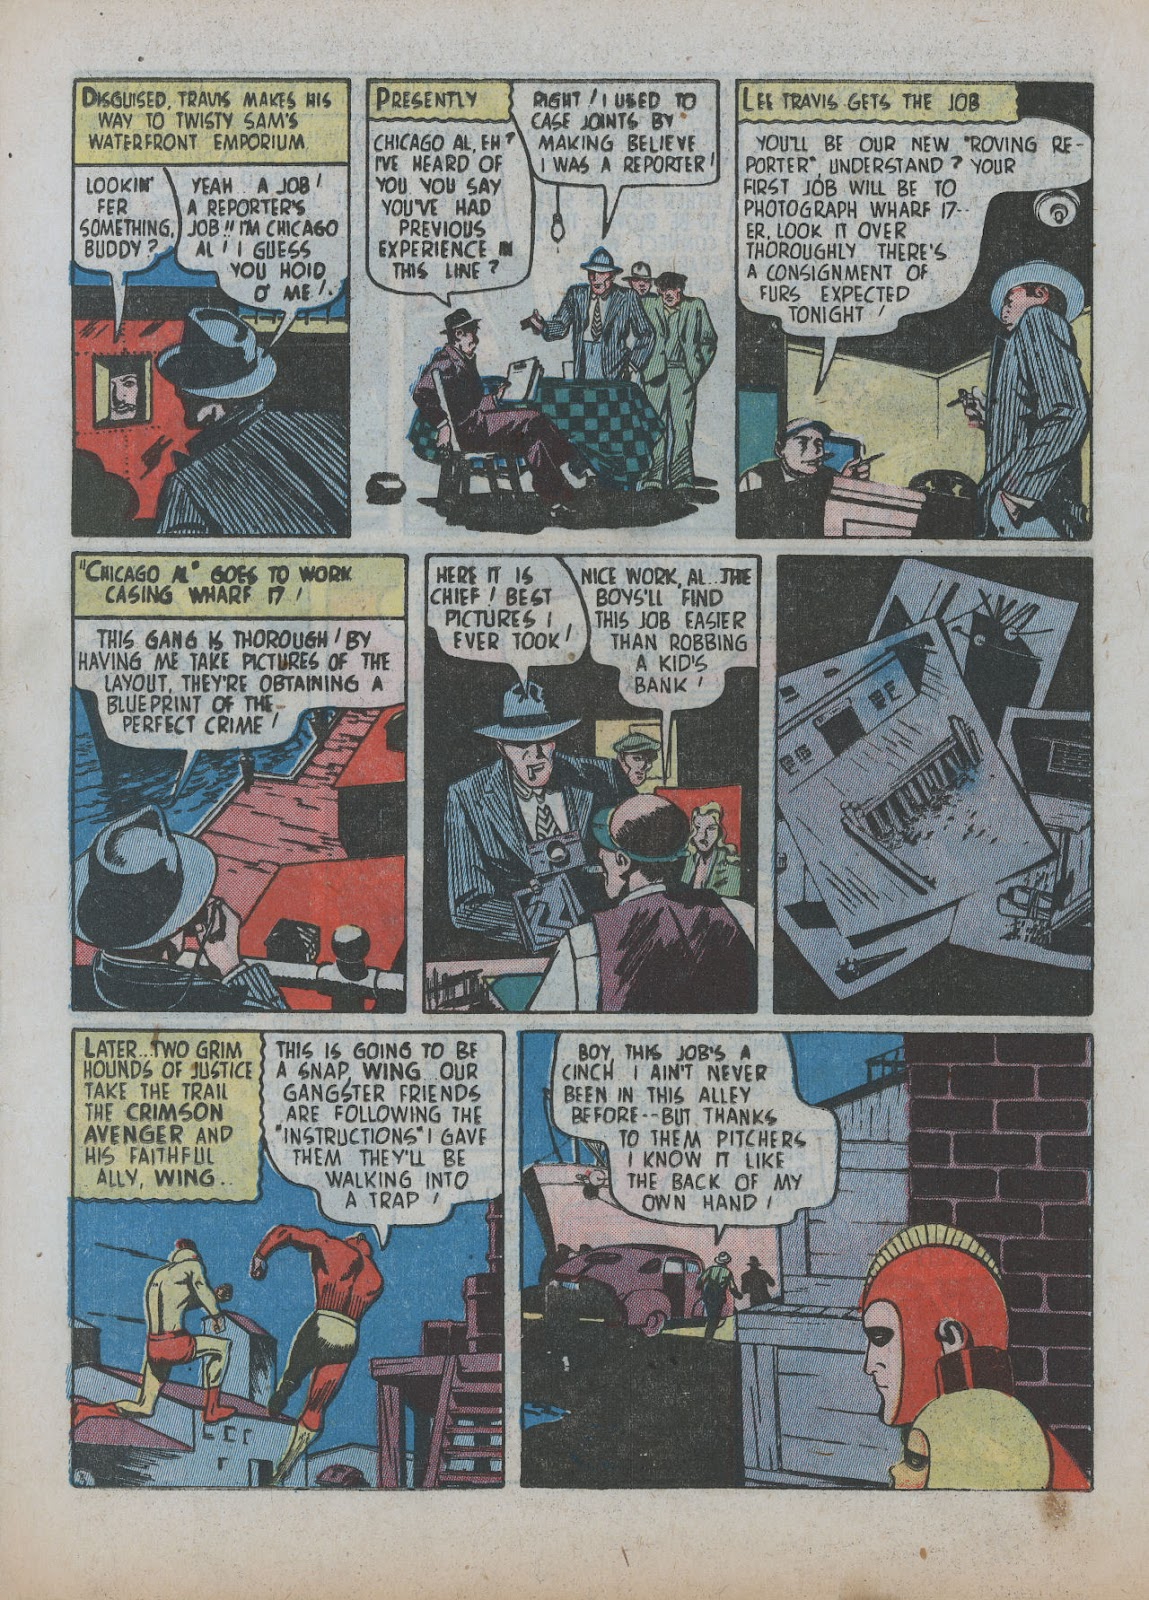 Comic Detective Comics 1937 Issue 76 Buddy Gang Boy 63 English 34